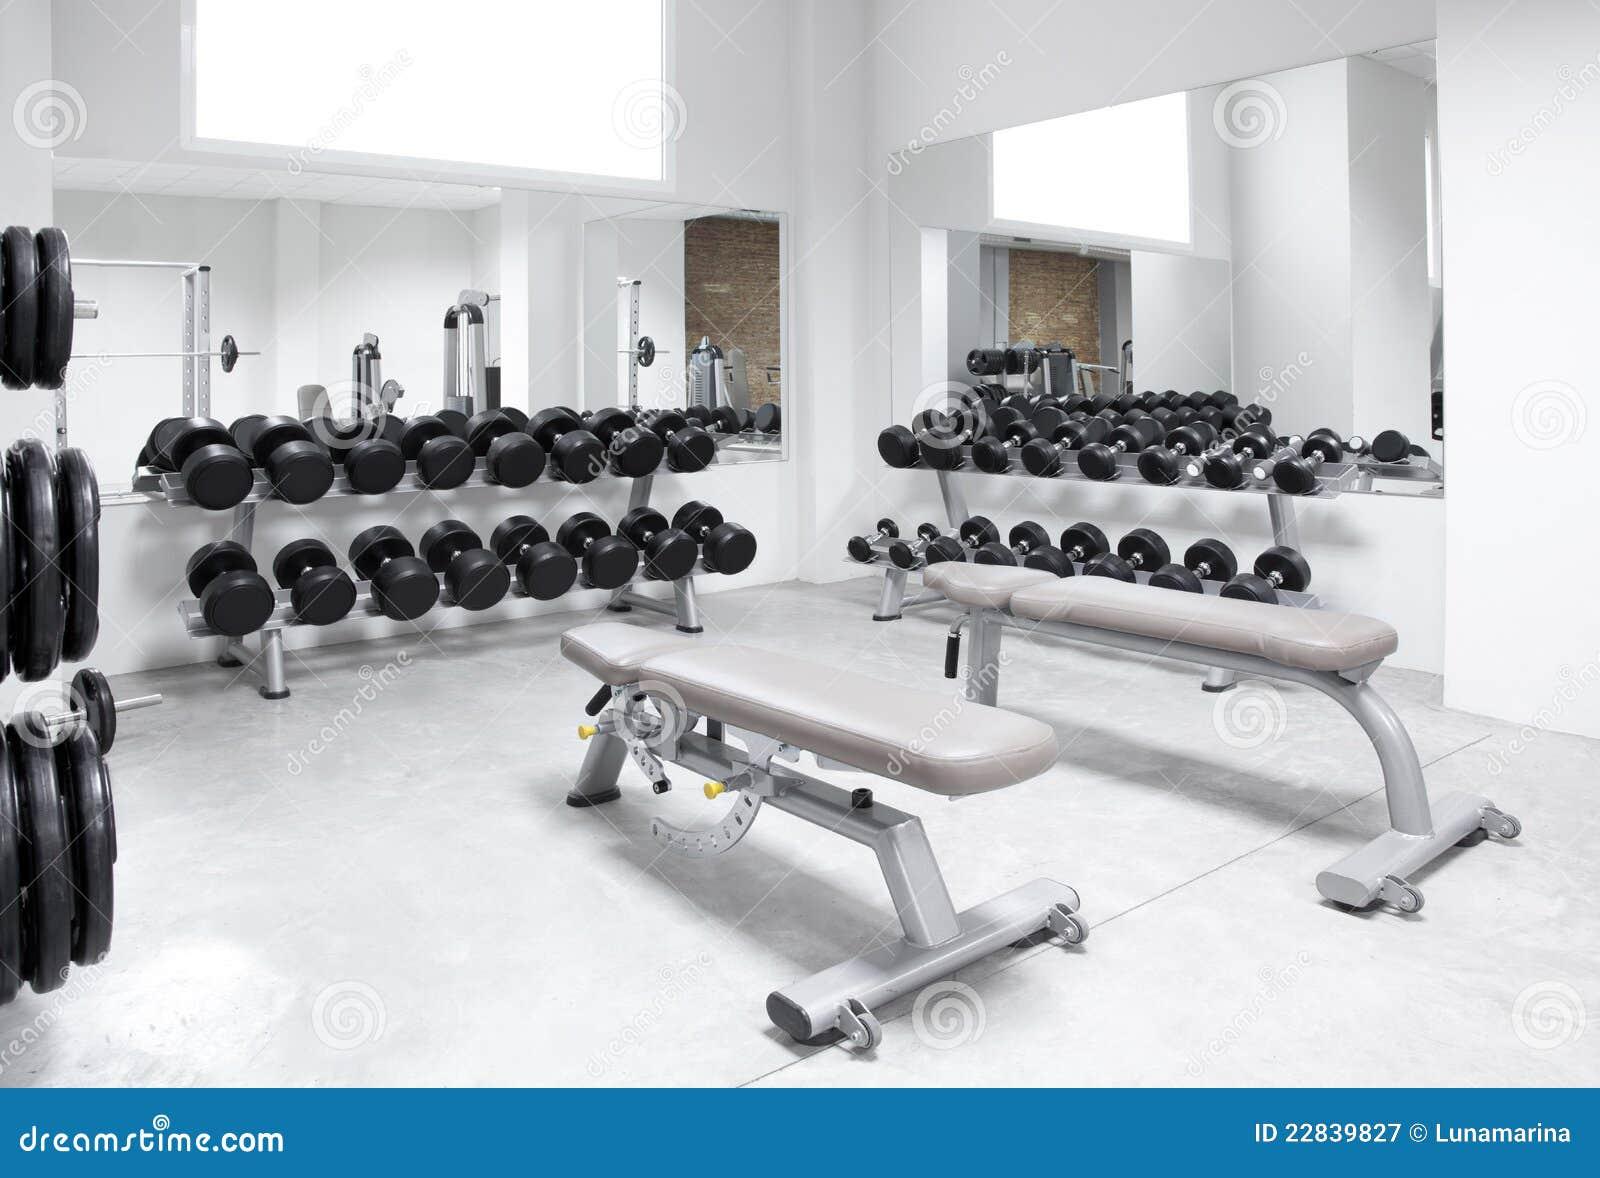 Fitness club weight training equipment gym stock image for Gimnasio fitness club